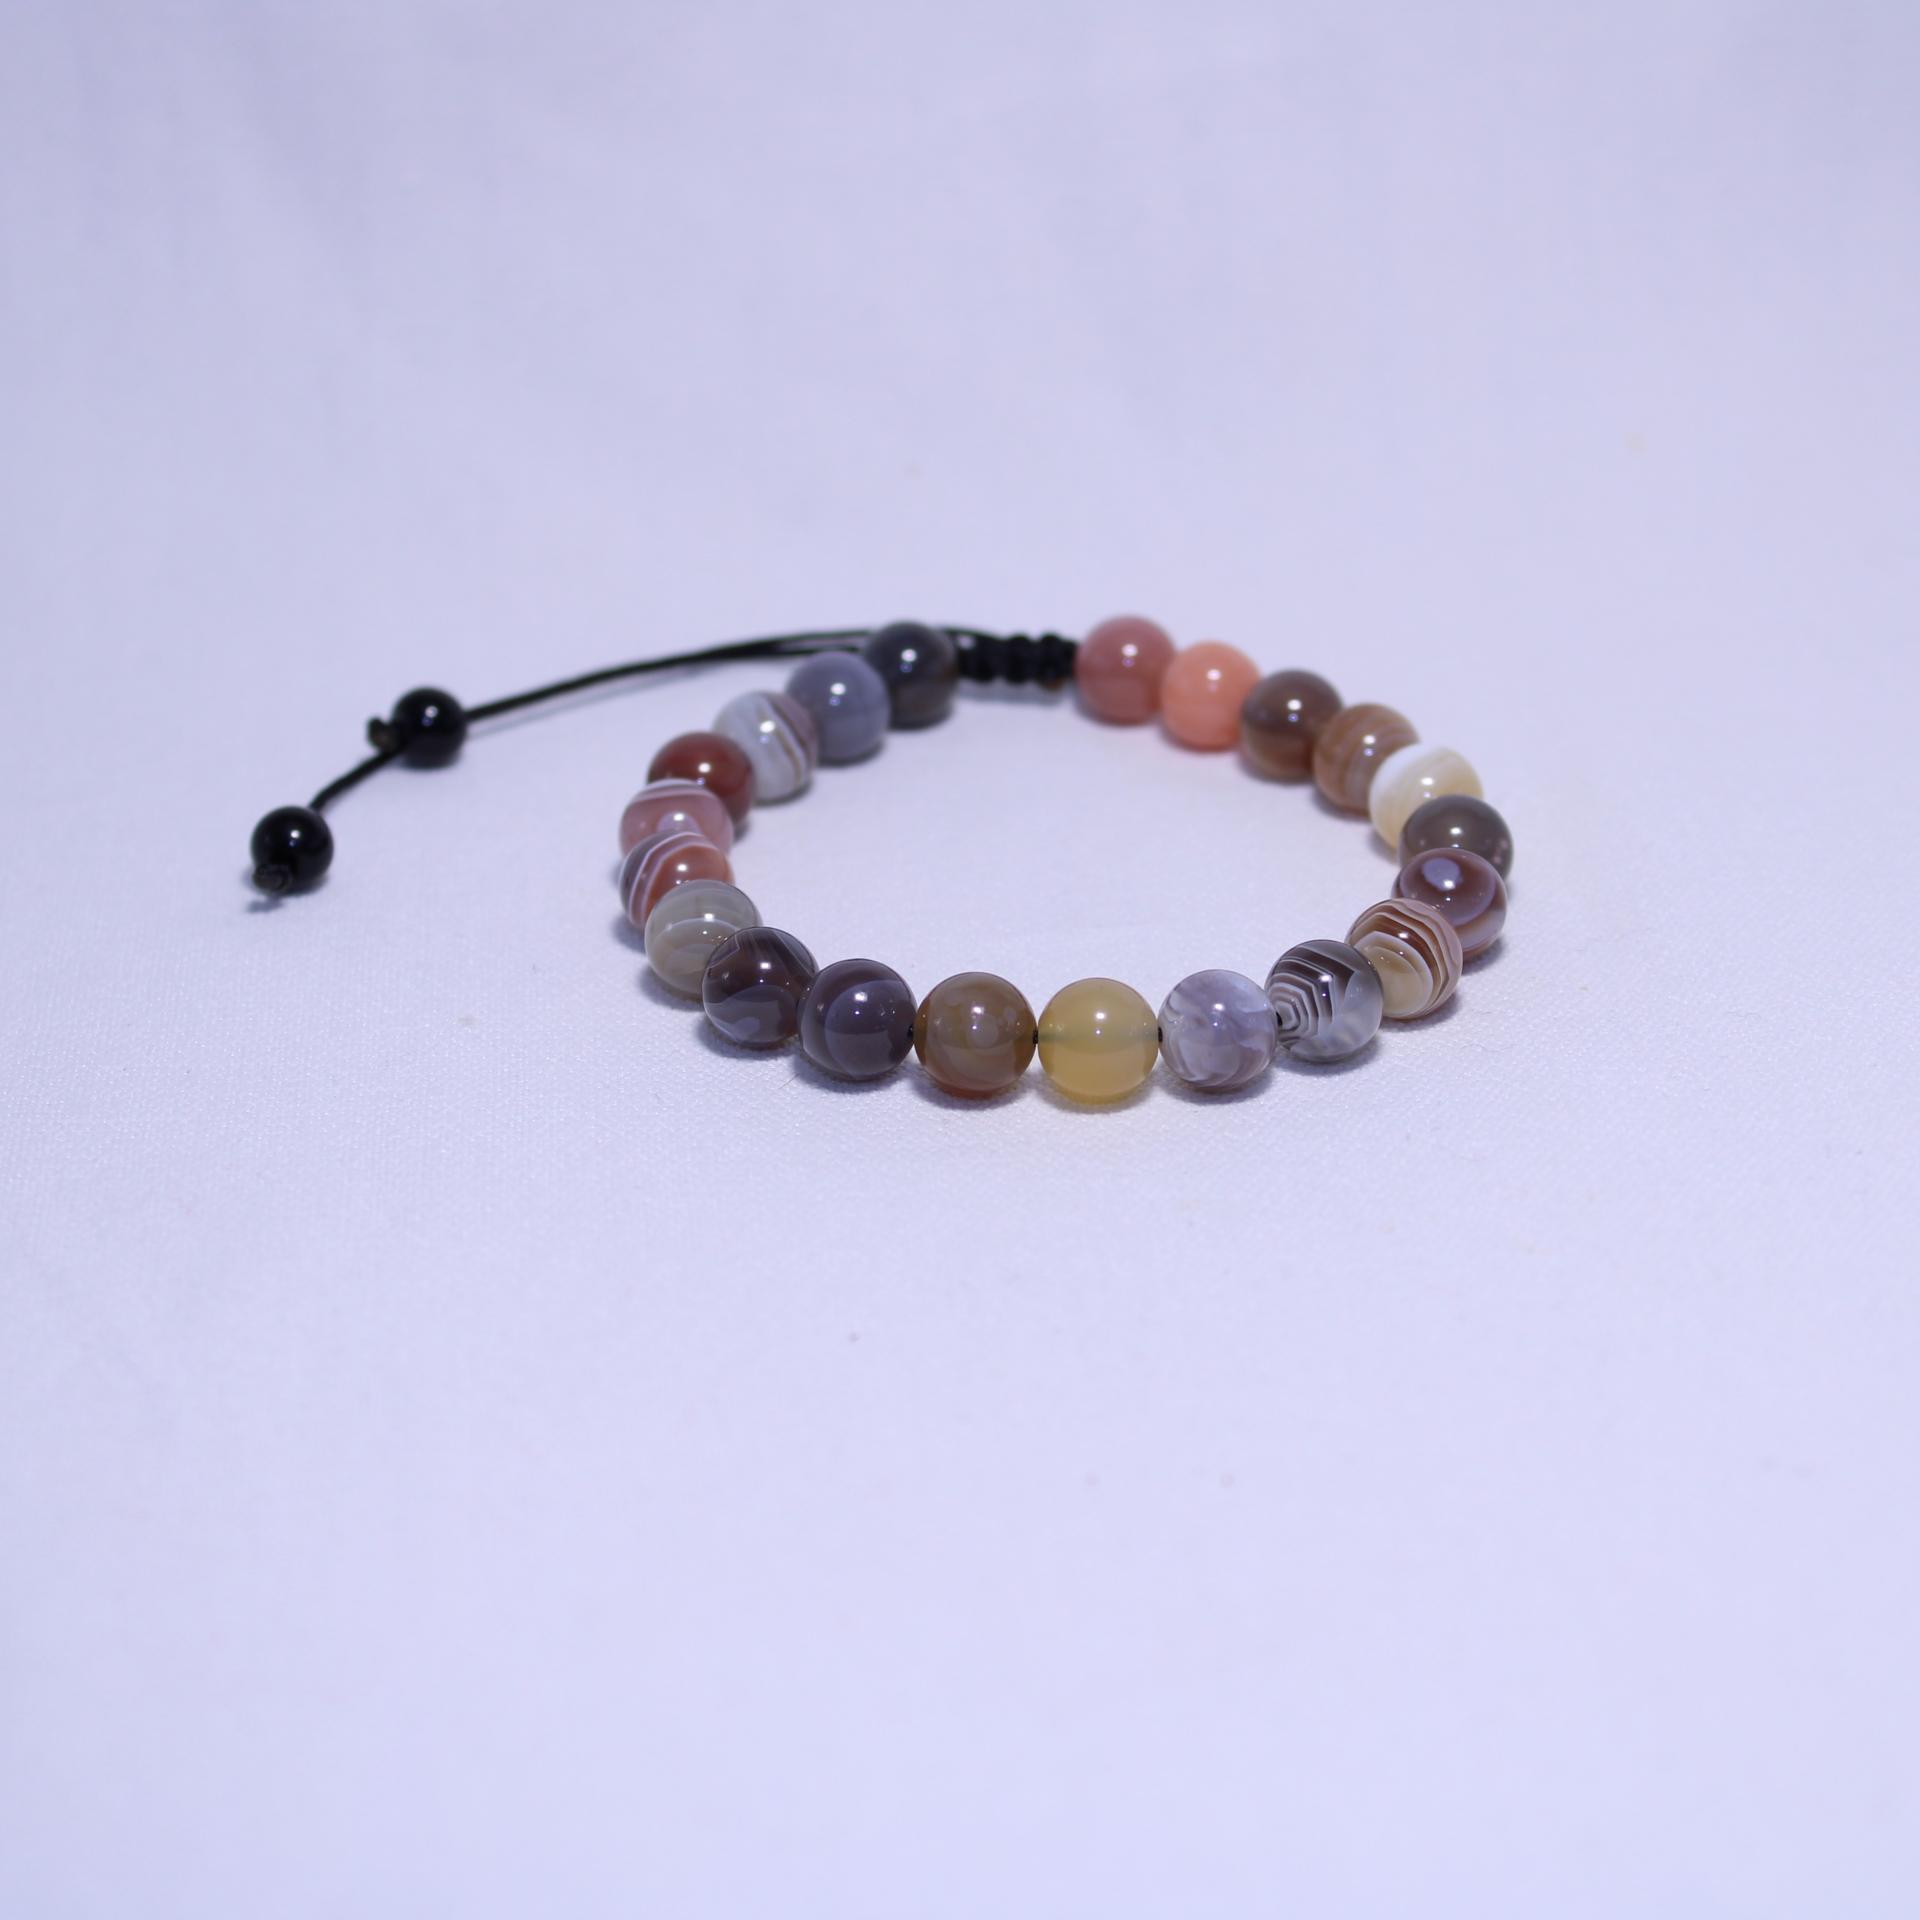 Bracelet agate i24 3